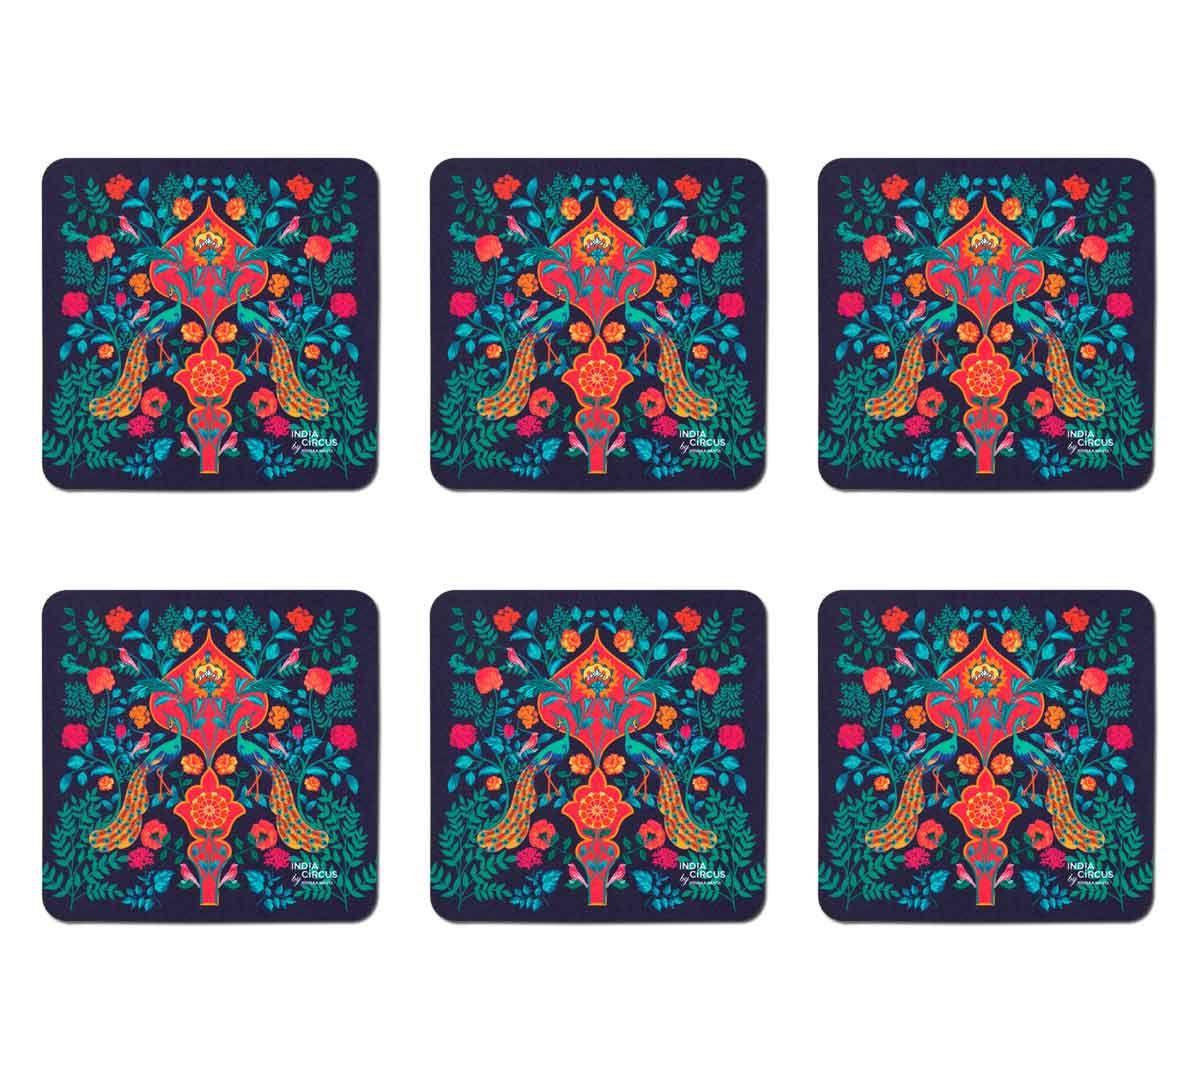 India Circus Fuchsia Birds and Floral Burst Table Coaster